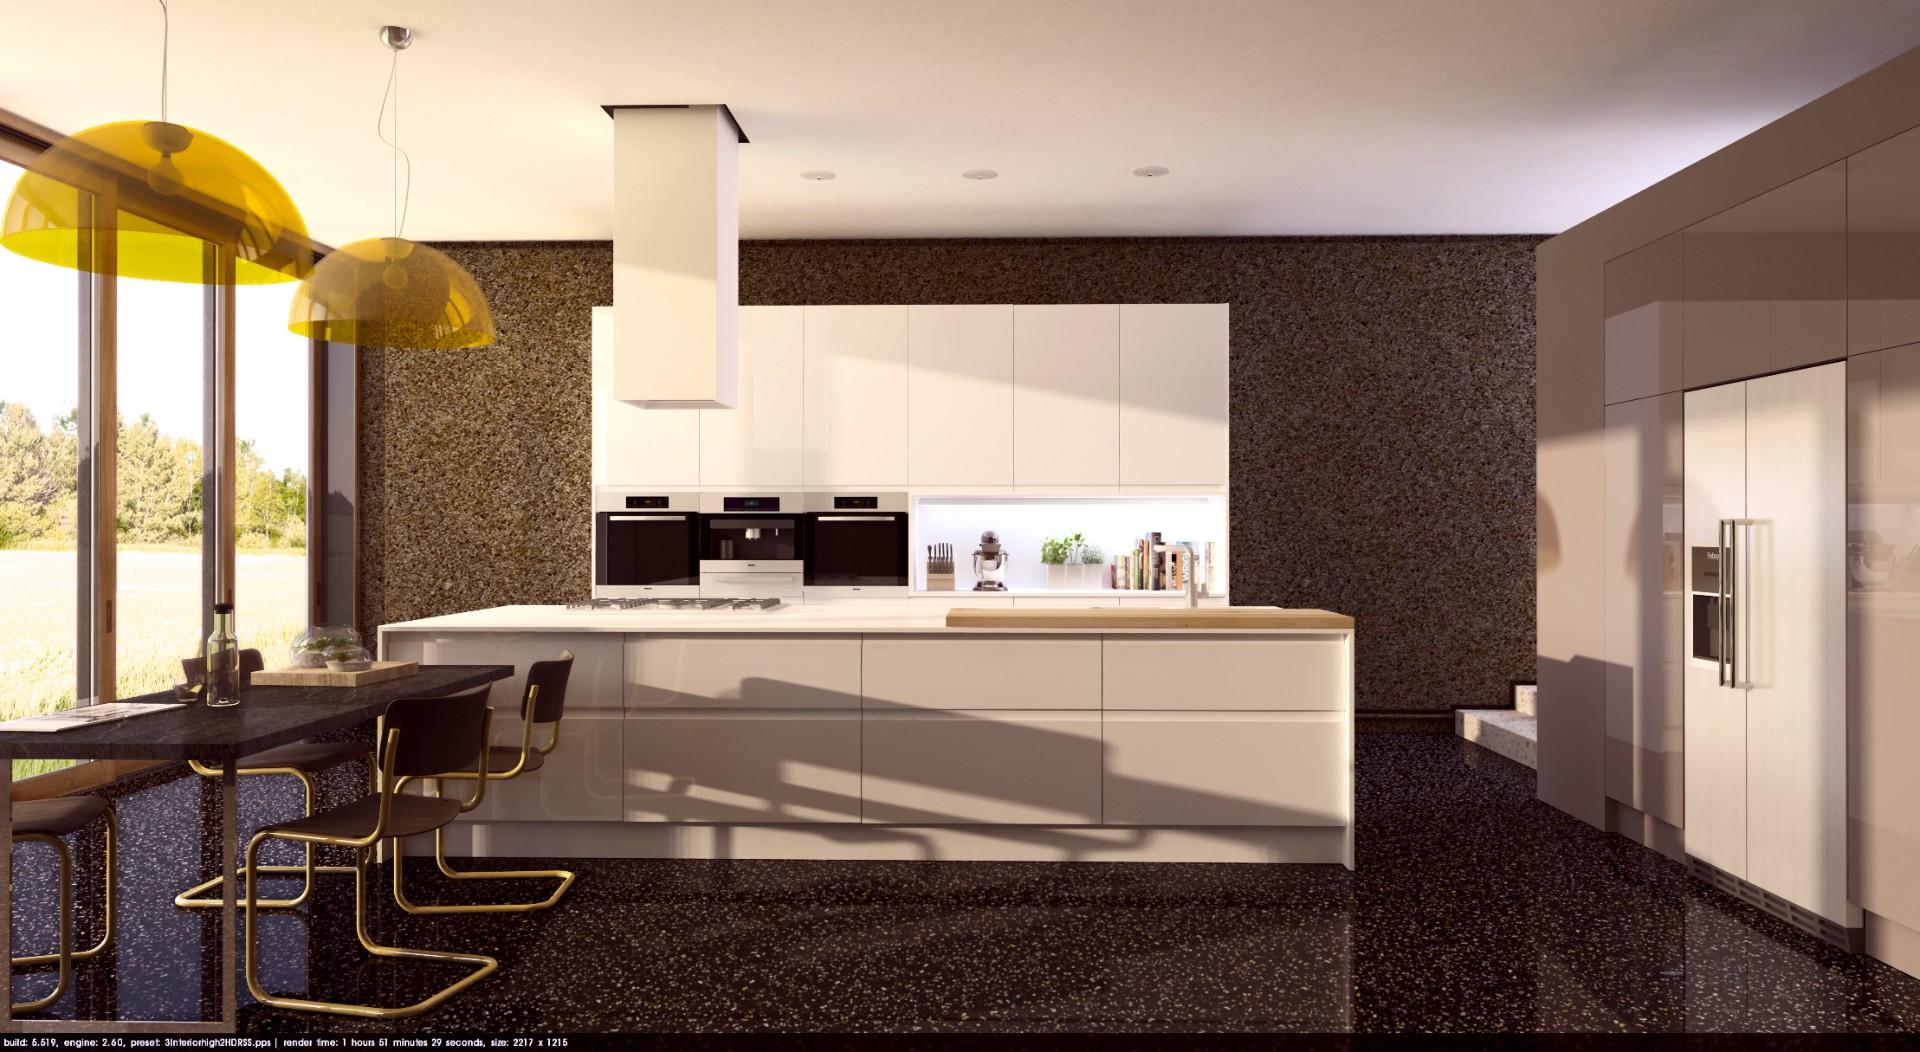 Witt_lucca_kitchen_blackterrazzo_1_1221.jpg